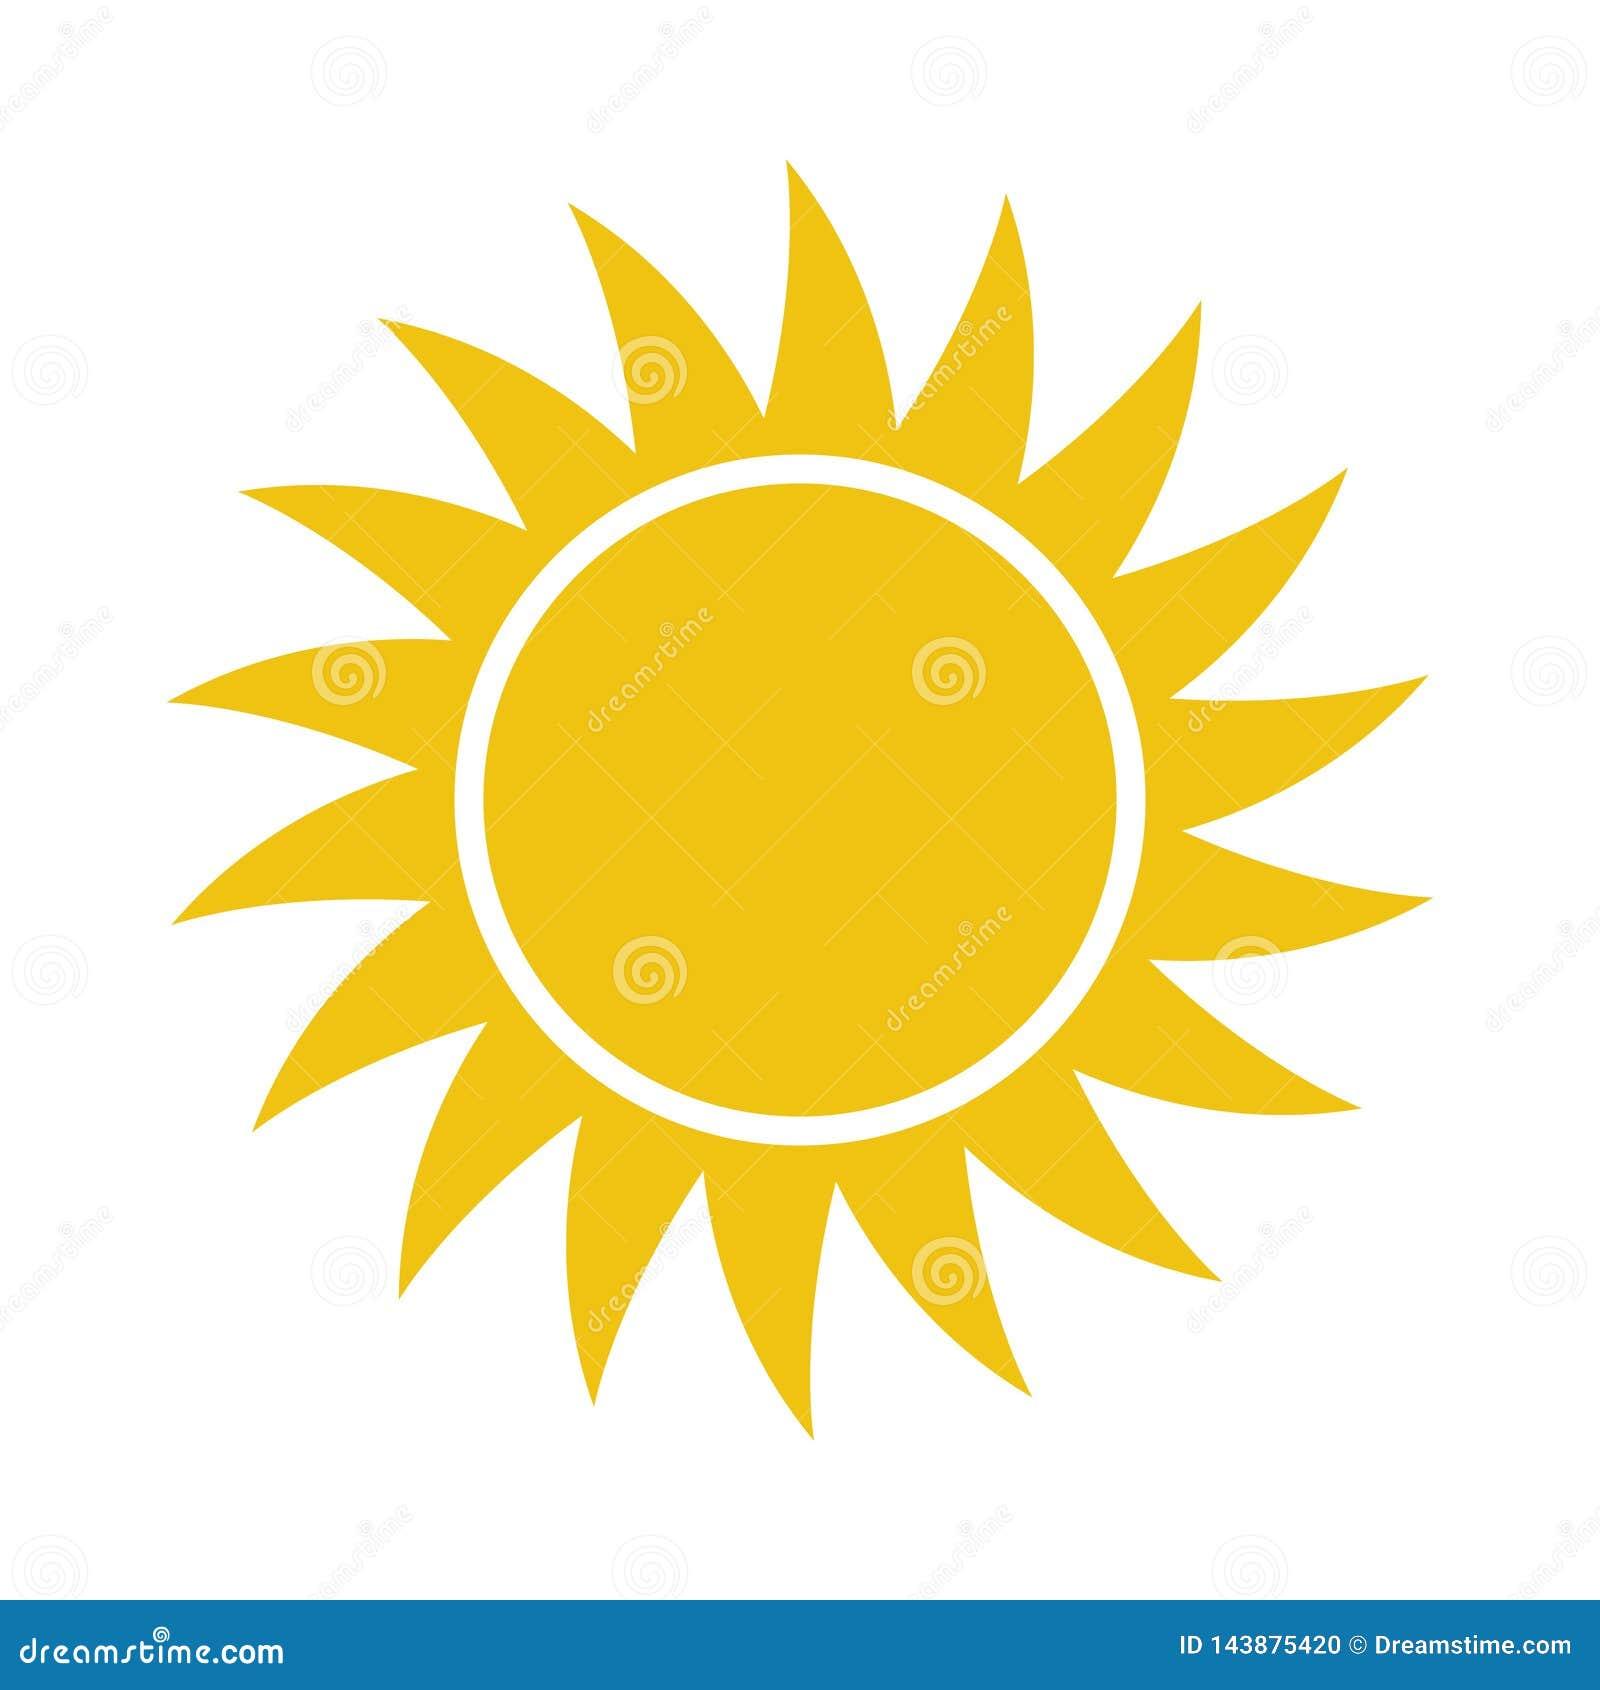 Flache Sun-Ikone Sun-Piktogramm Schablonenvektorillustration